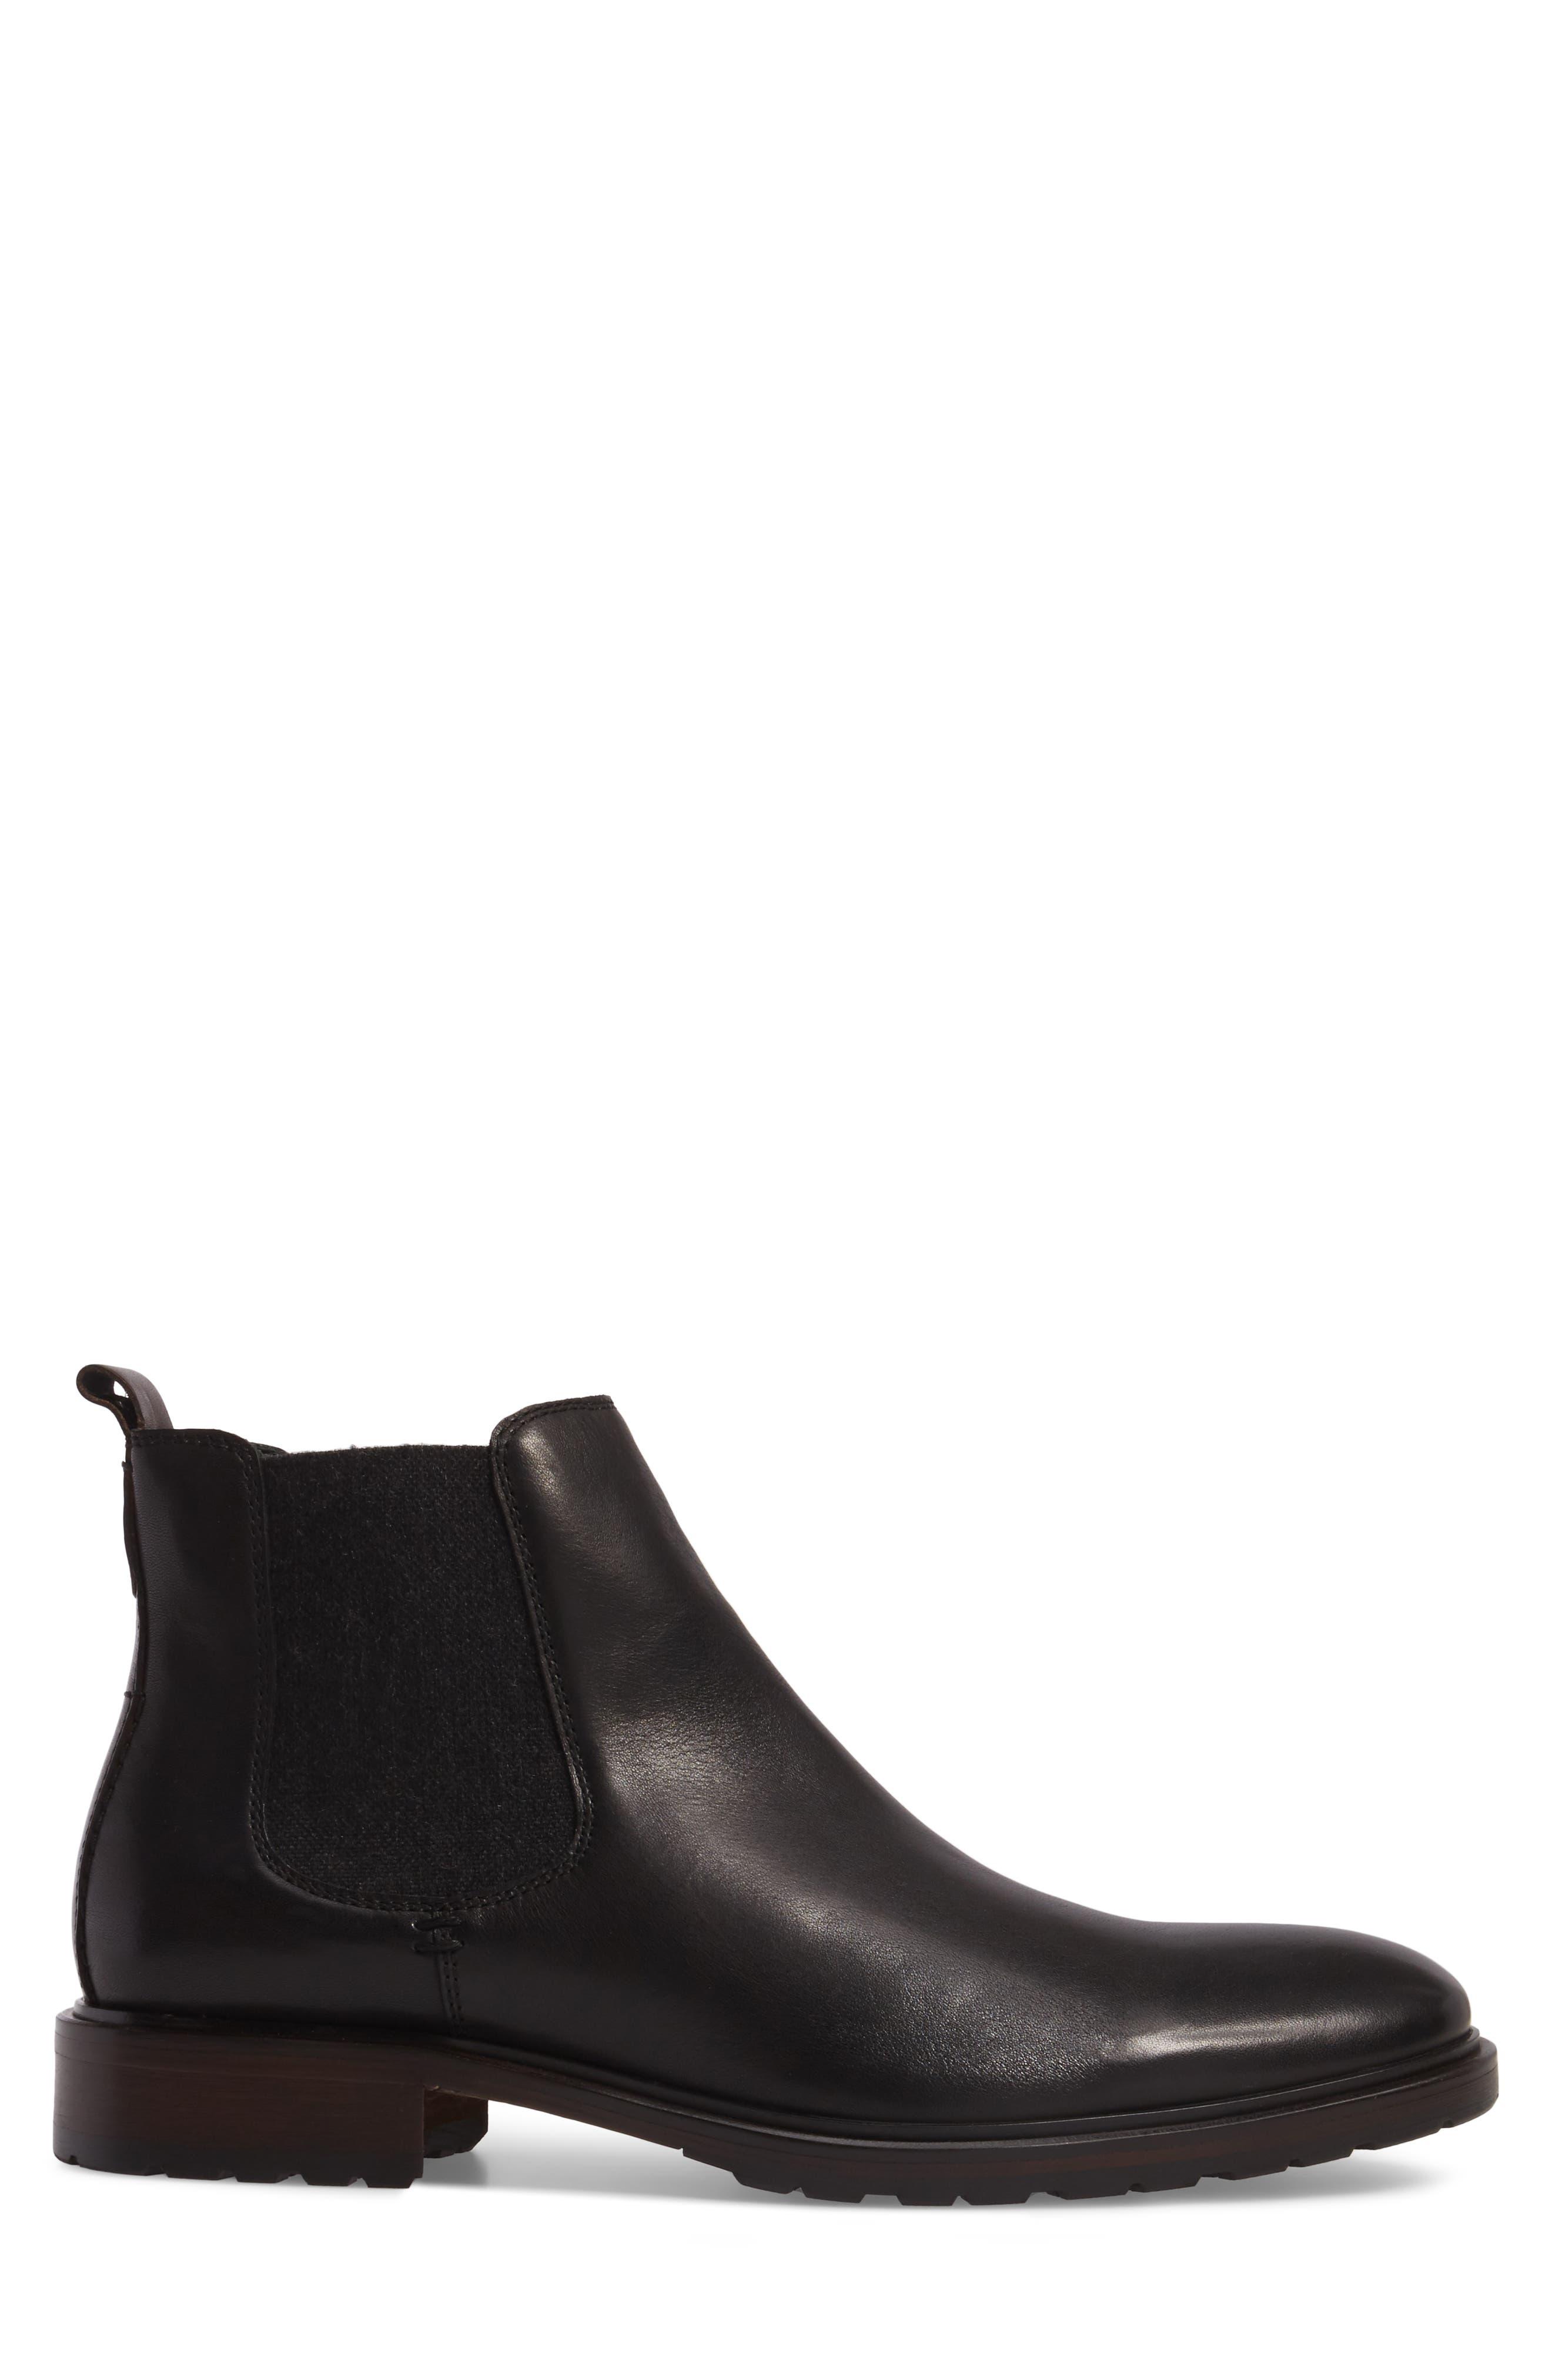 Myles Chelsea Boot,                             Alternate thumbnail 3, color,                             Black Leather